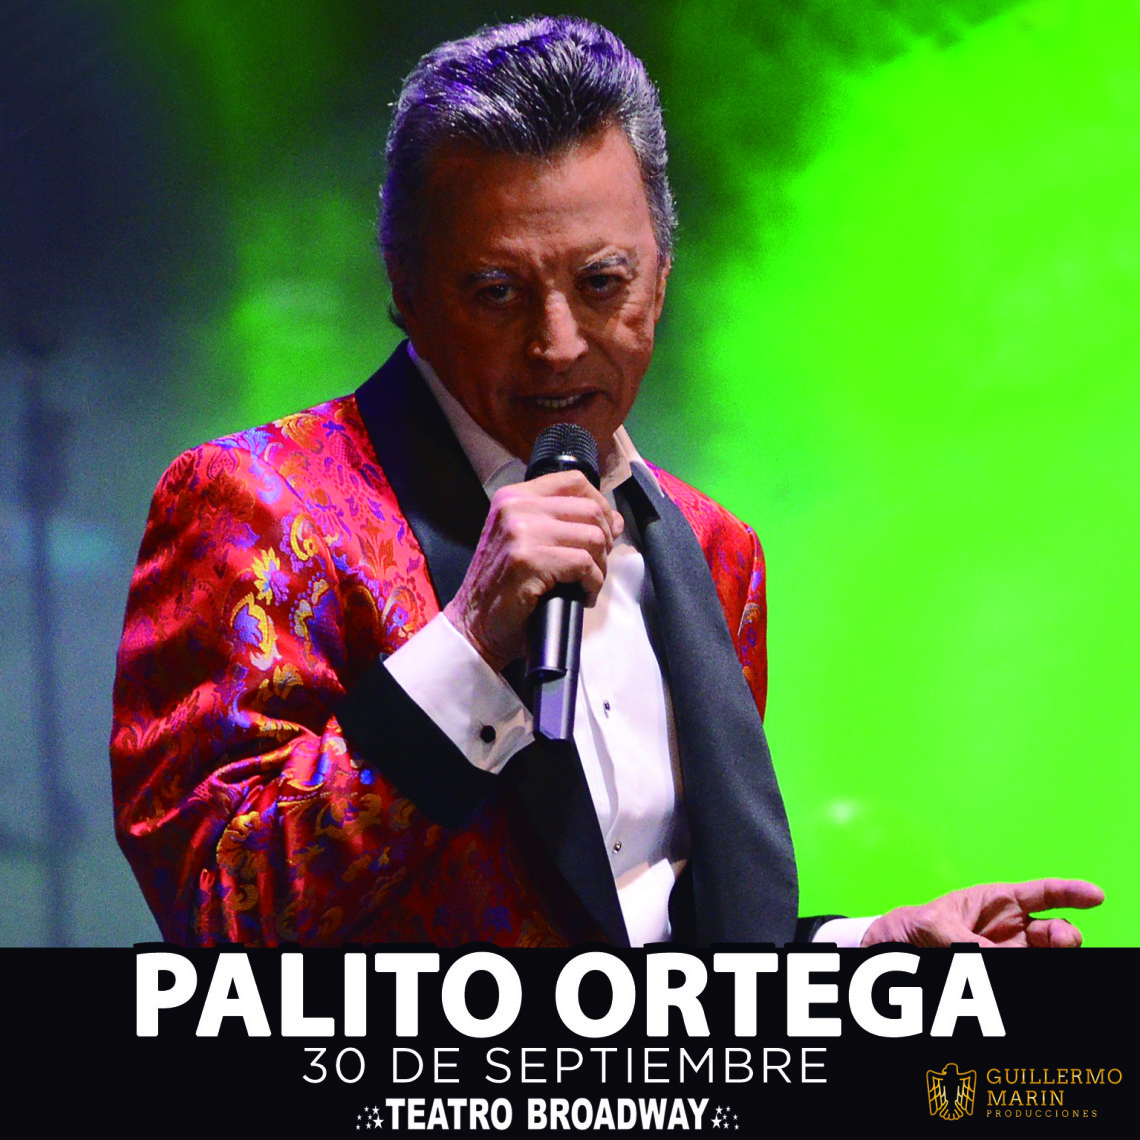 Palito Ortega 30-09-2018